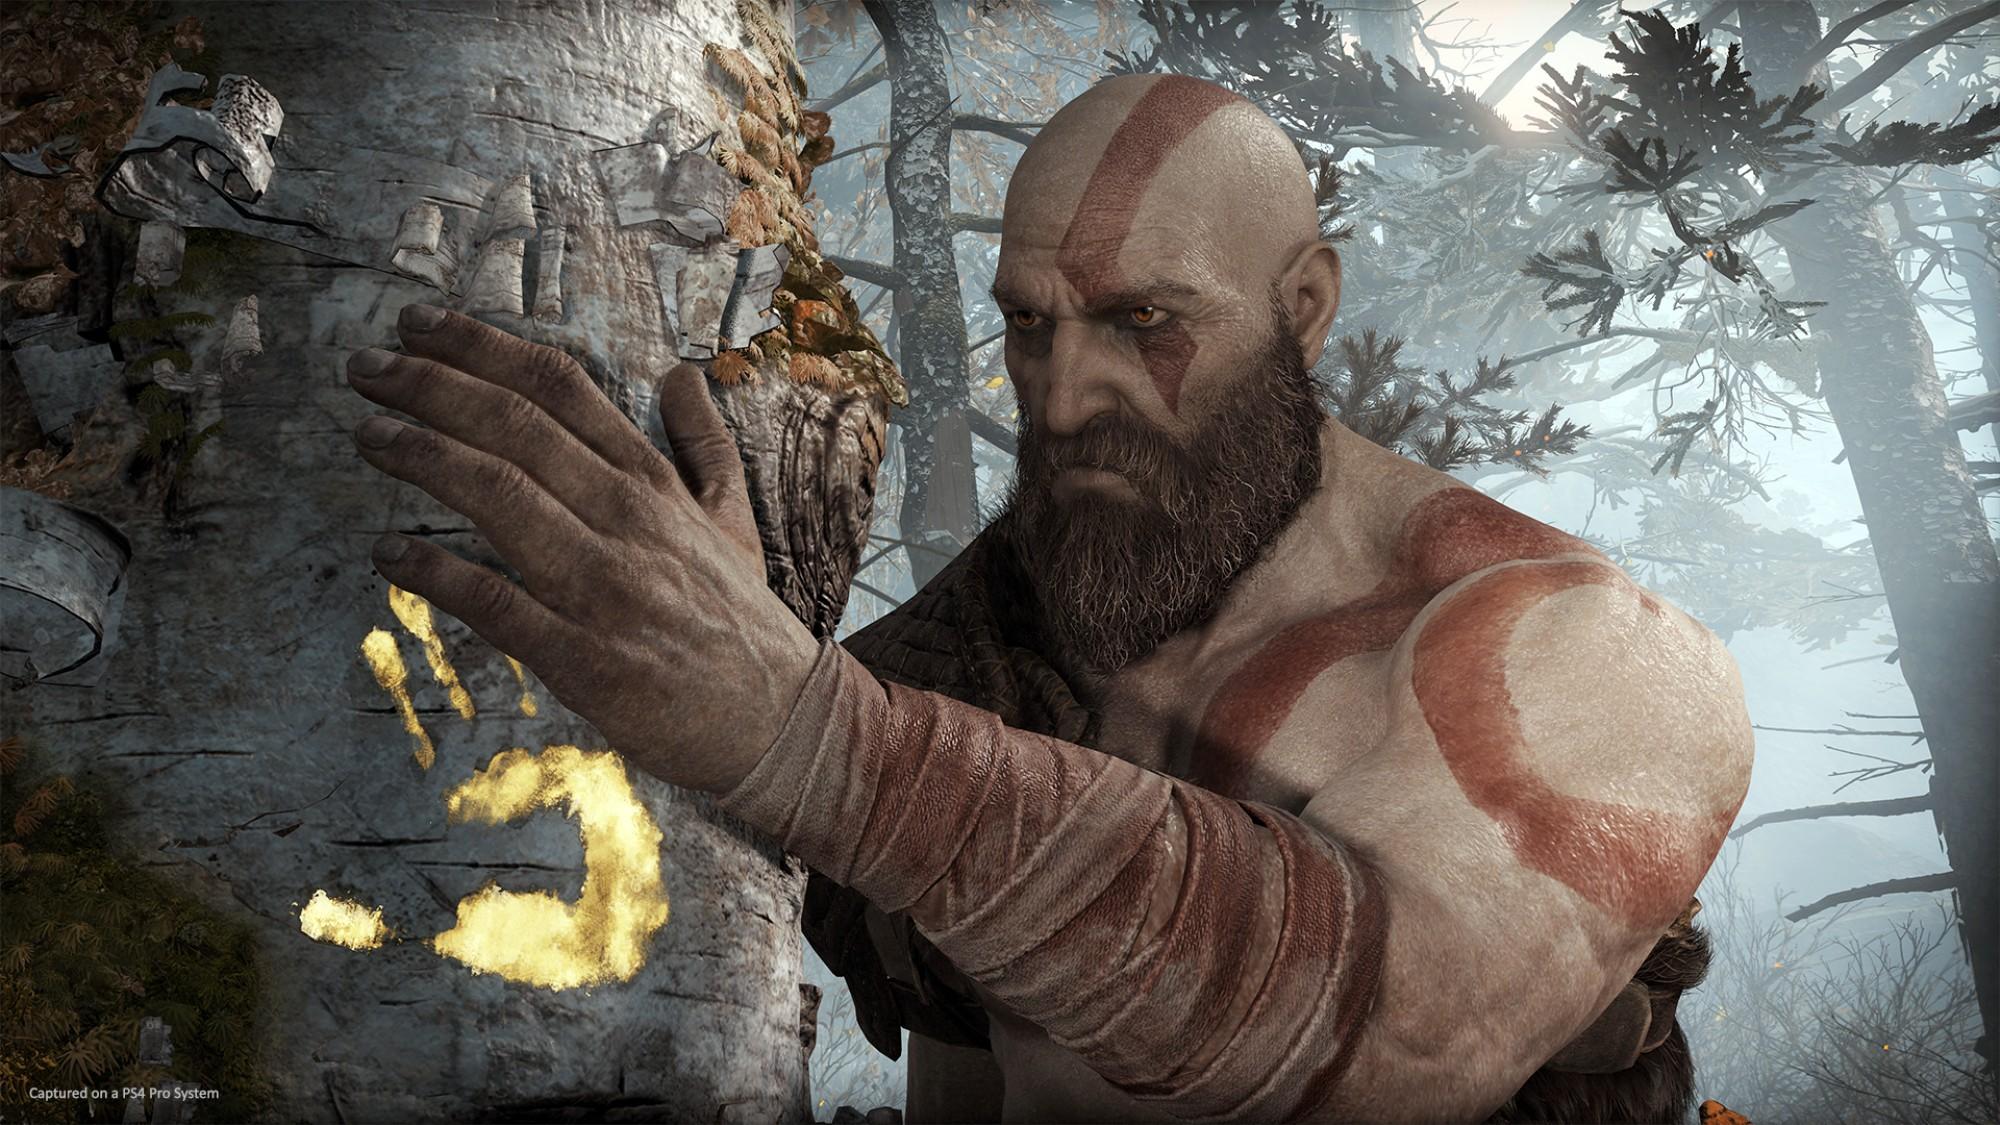 The Real Ancient Myth at the Heart of 'God of War' - VICE